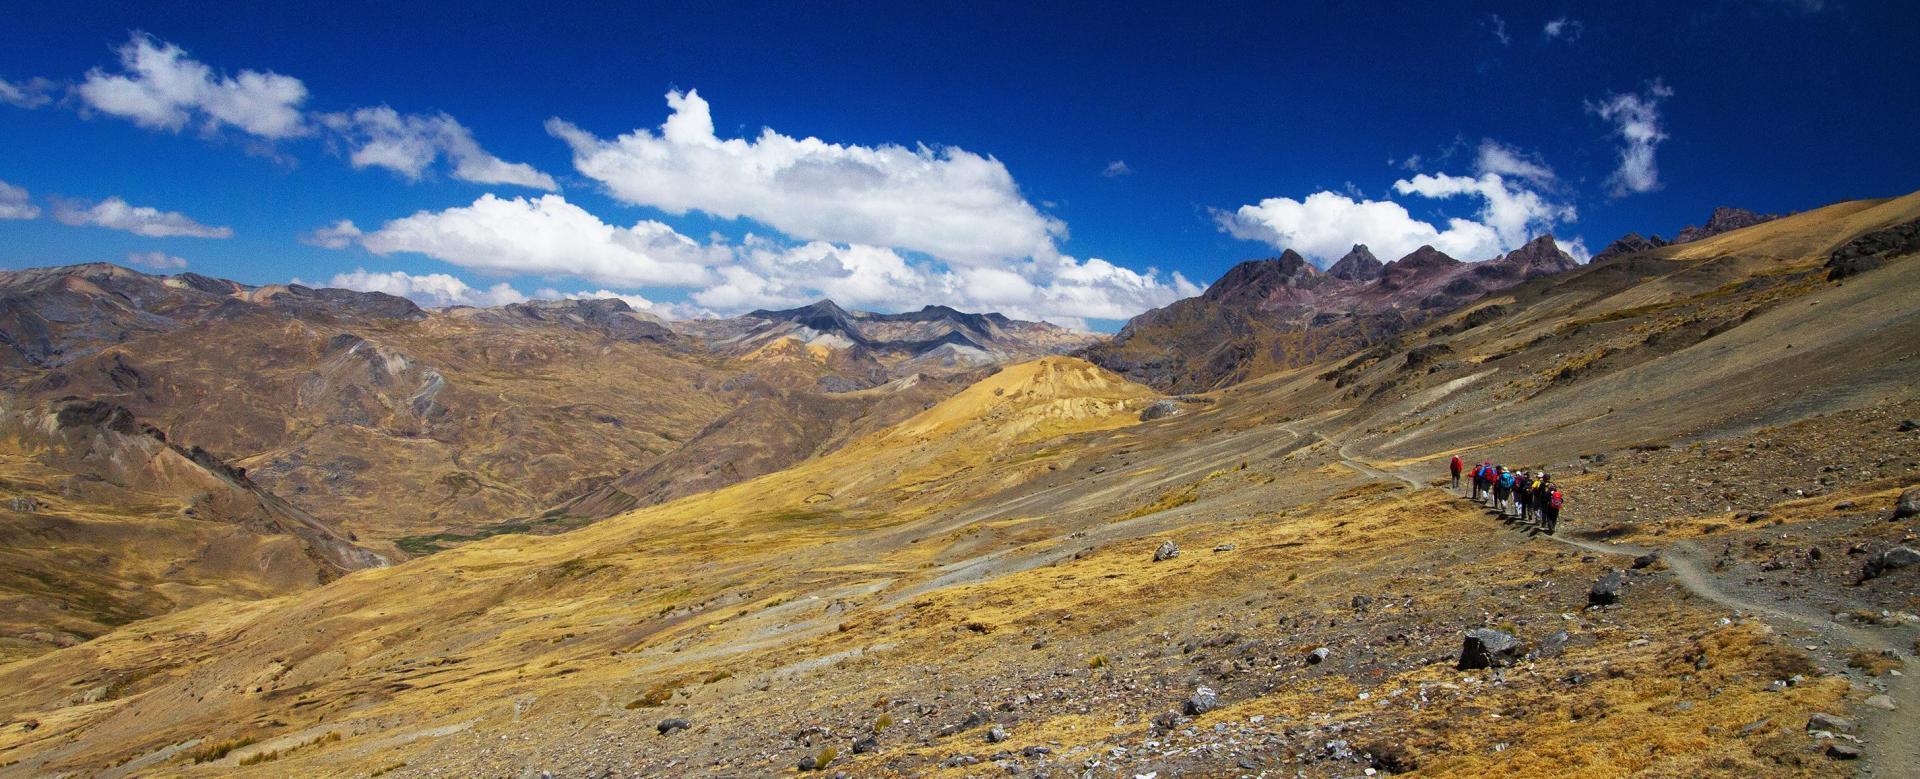 Voyage à pied Pérou : De l'urubamba à vilcanota